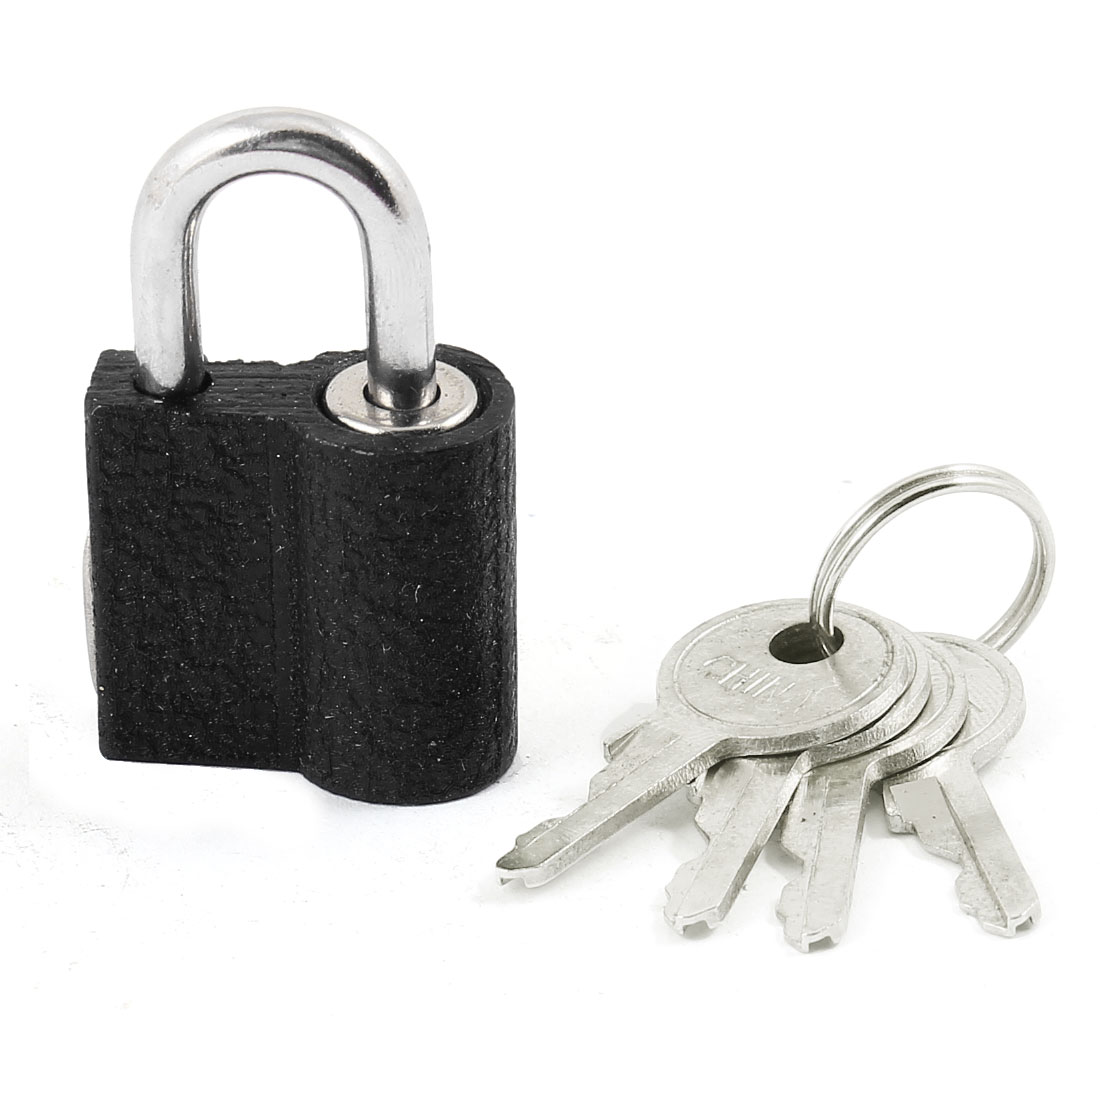 "Home Door Cabinet Black Security Lock Padlock 1.7"" Long w 4 Keys"